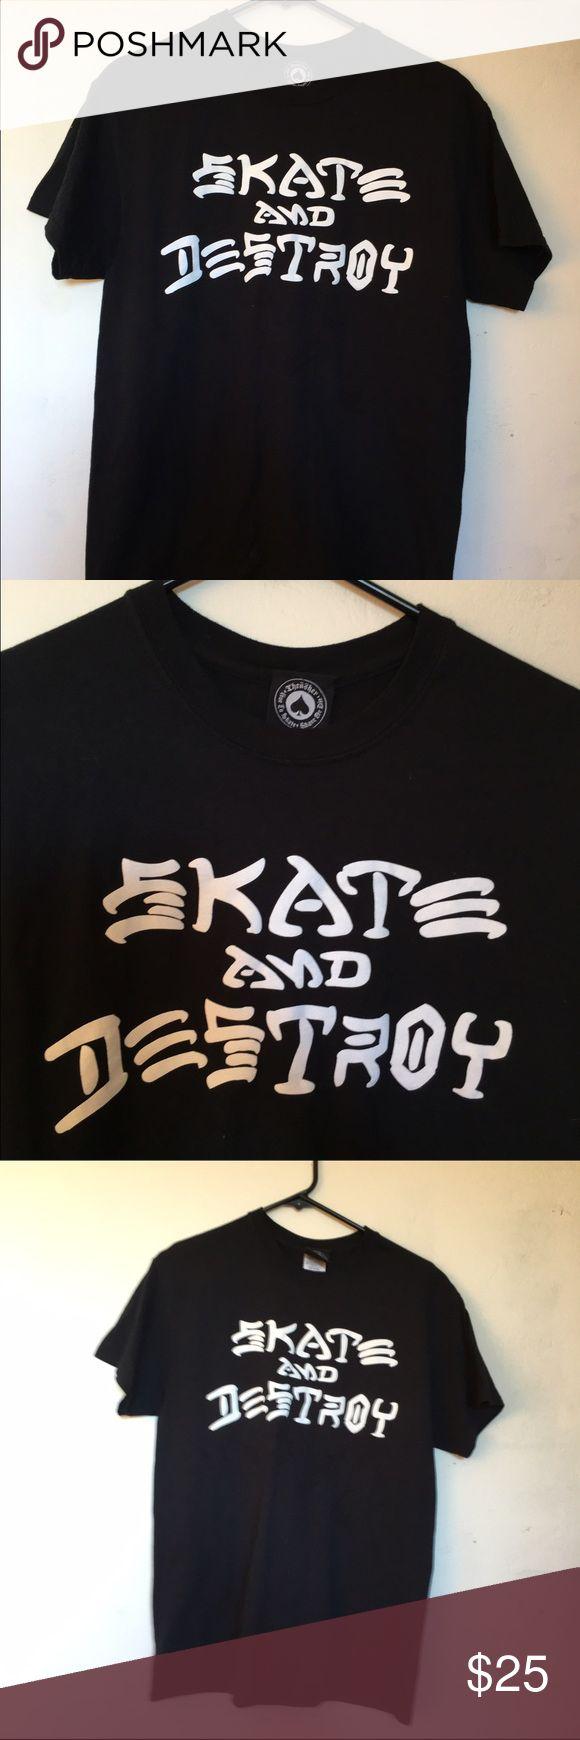 Selling this Black/White Skate and Destroy Thrasher on Poshmark! My username is: marlenegonzlez. #shopmycloset #poshmark #fashion #shopping #style #forsale #Thrasher #Tops